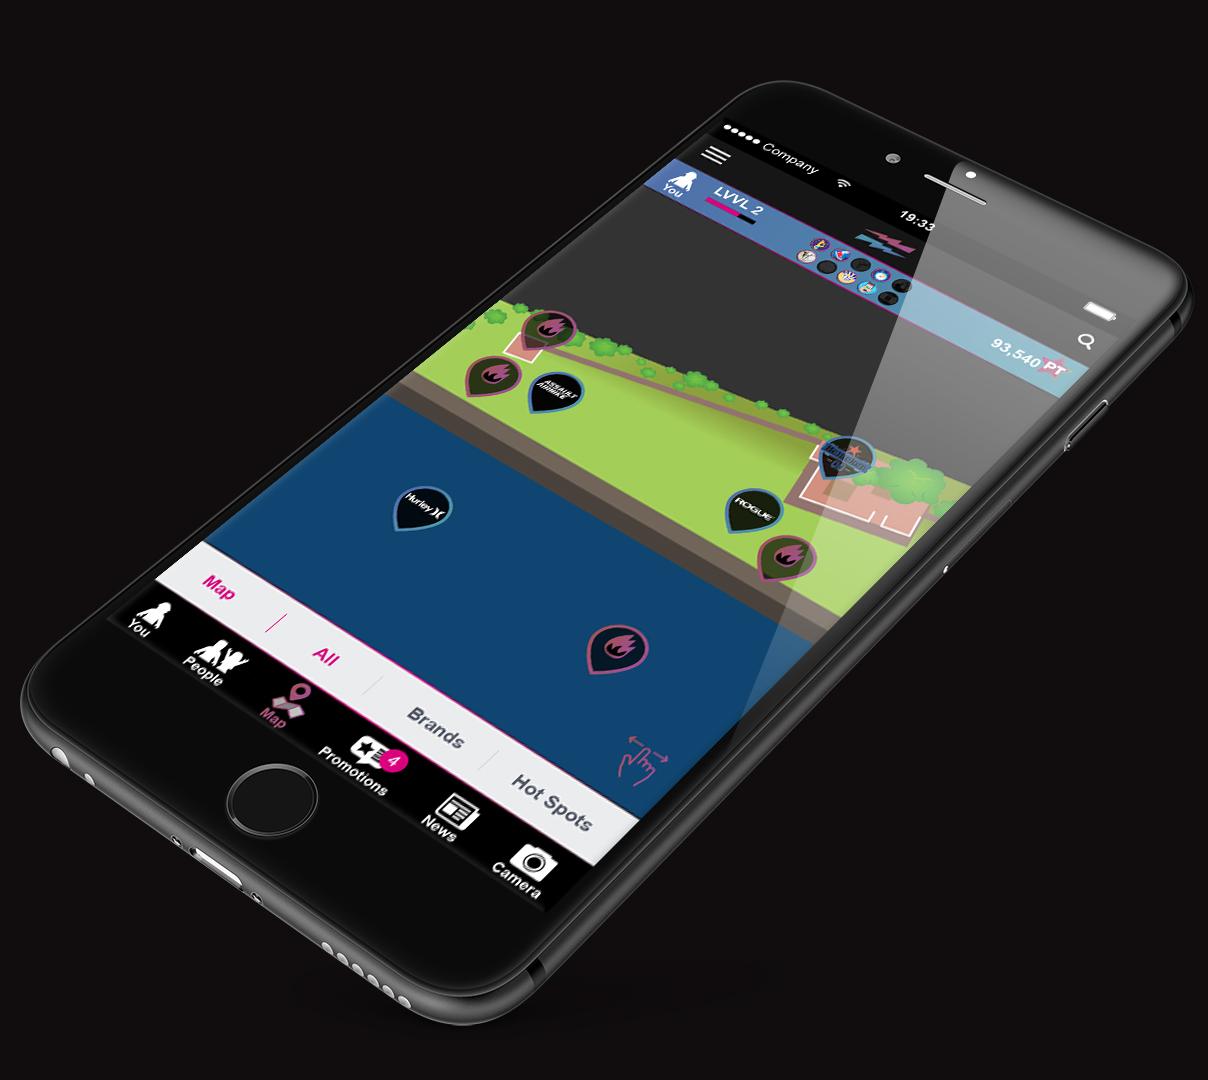 LEVVEL iPhone_Plus_app_map all swipe.jpg